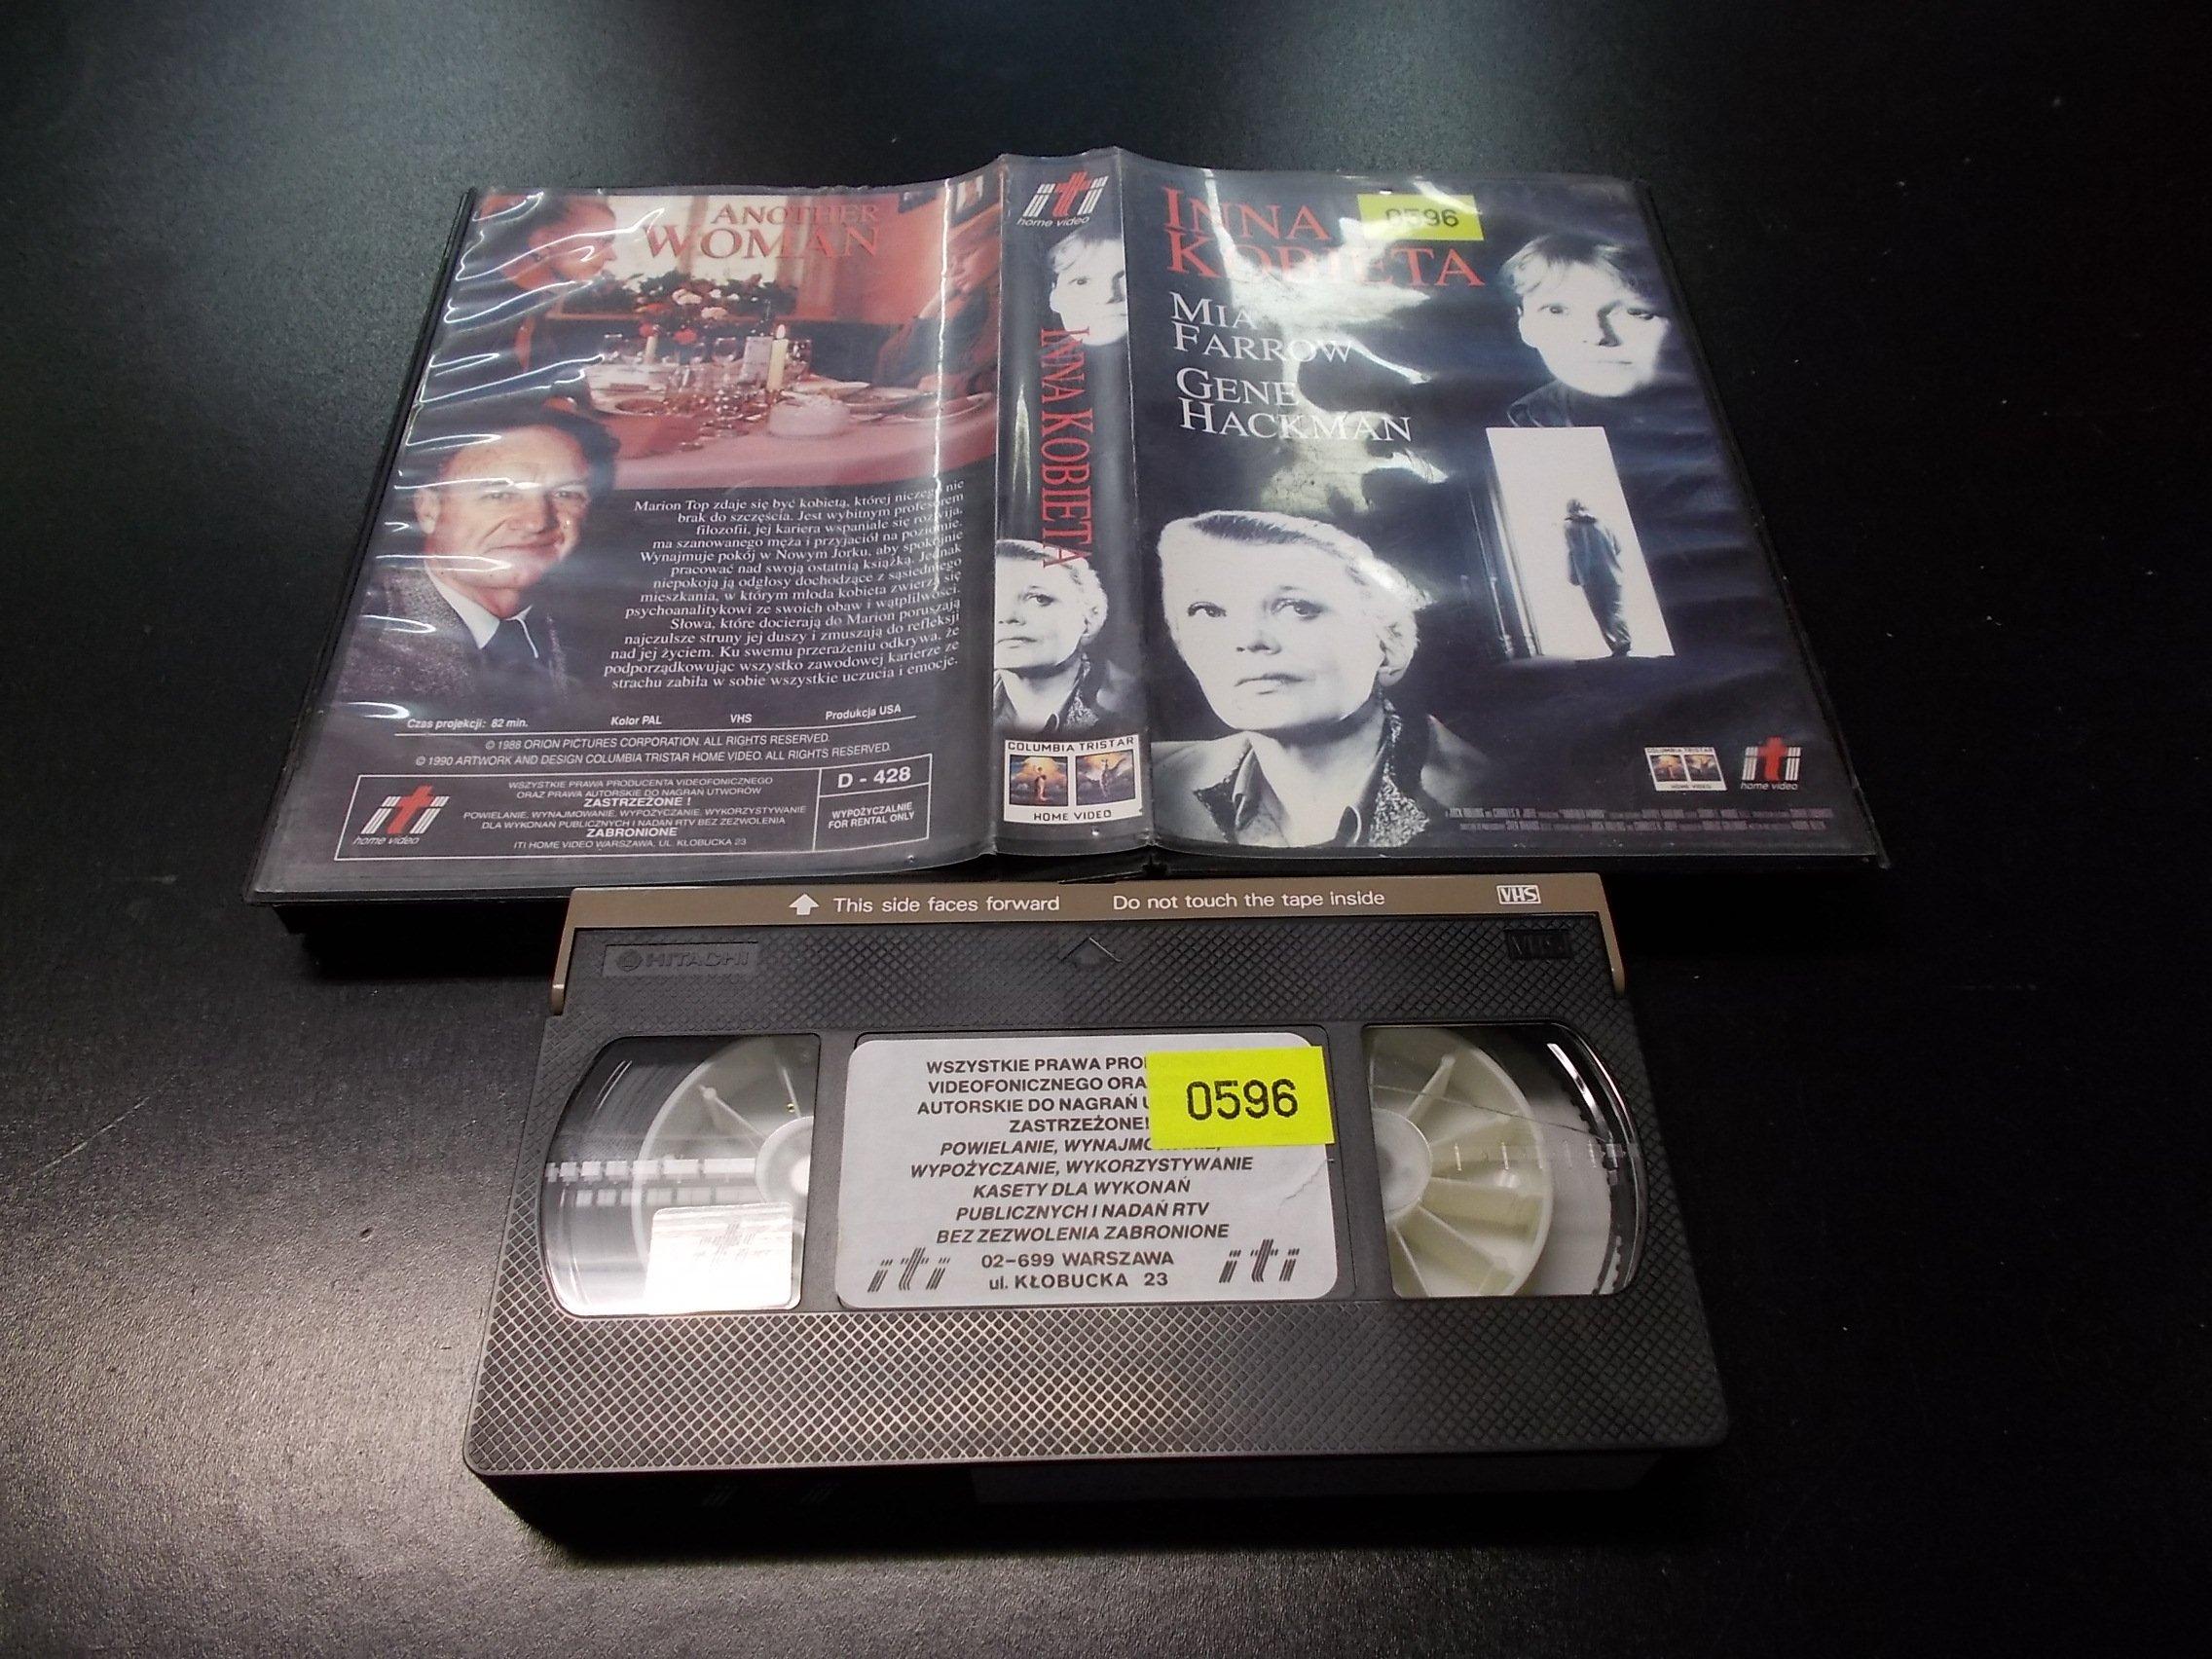 INNA KOBIETA -  kaseta VHS - 1218 Opole - AlleOpole.pl